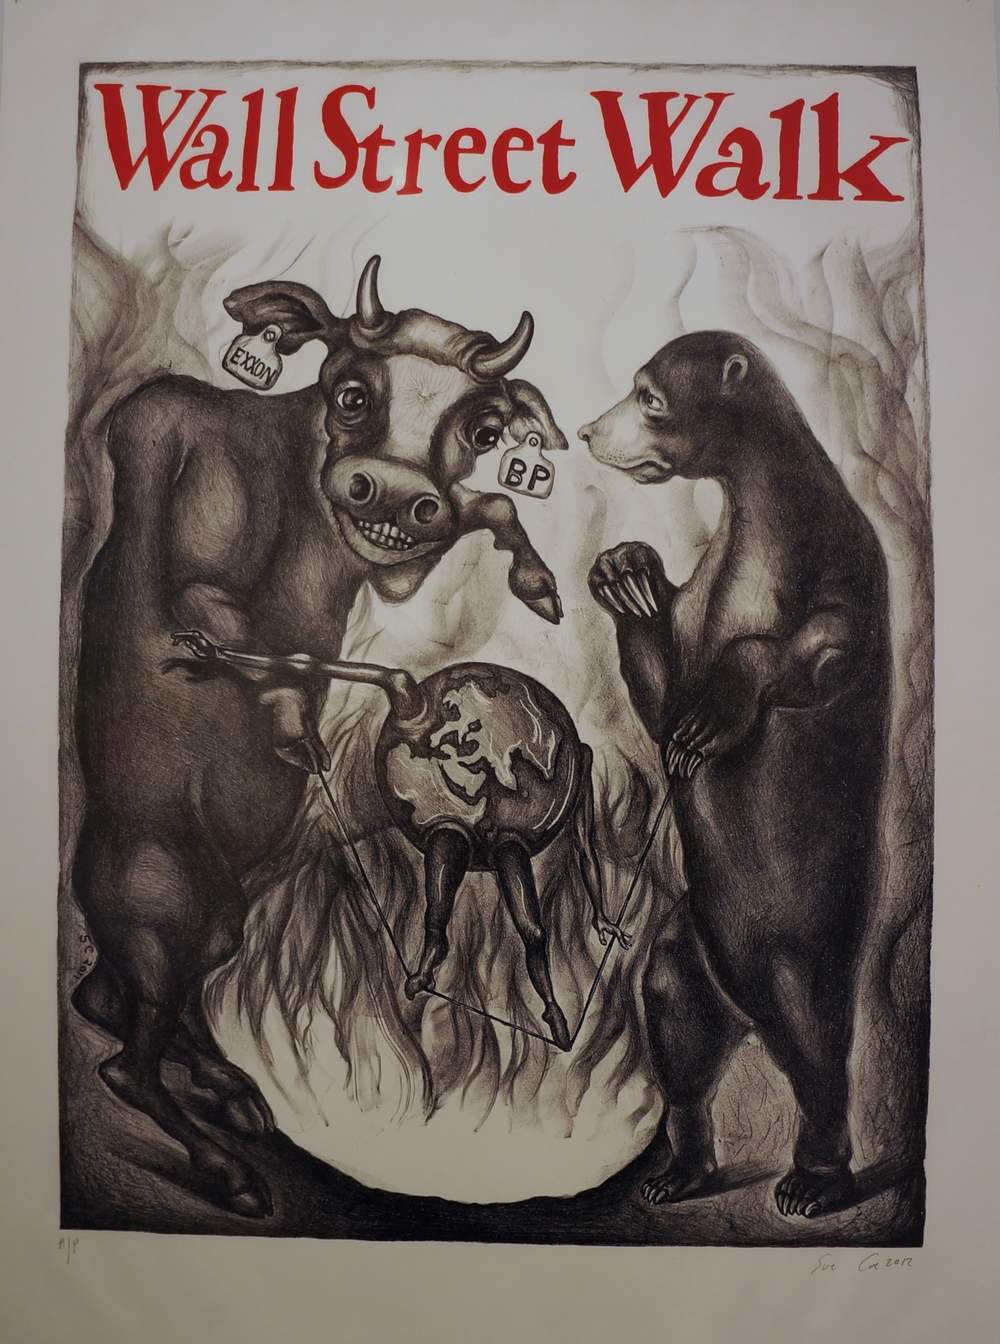 Sue Coe, Wall Street Walk